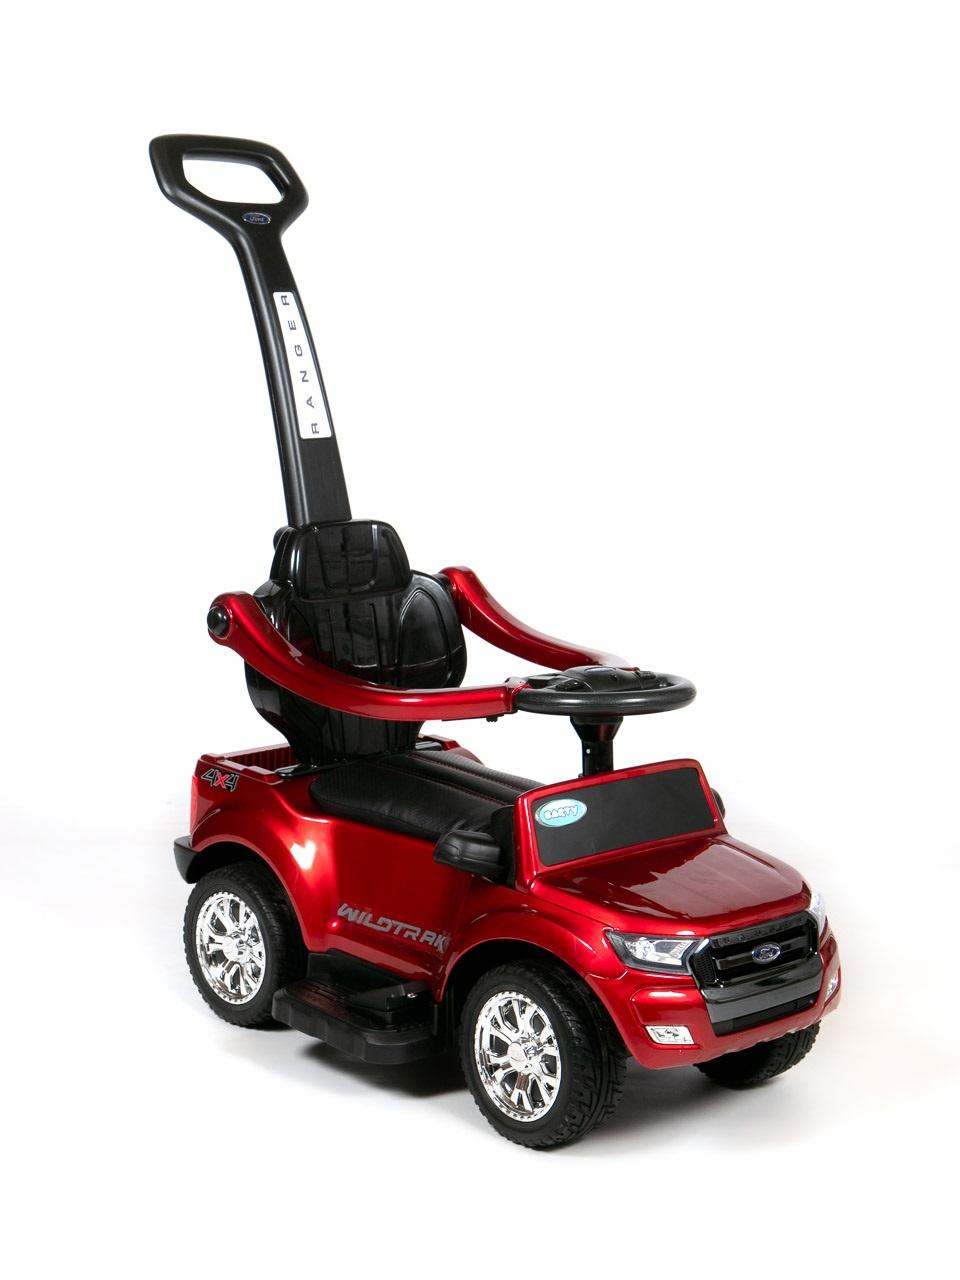 Толокар -Электромобиль- Каталка (3 в 1) Ford Ranger DK-P01P